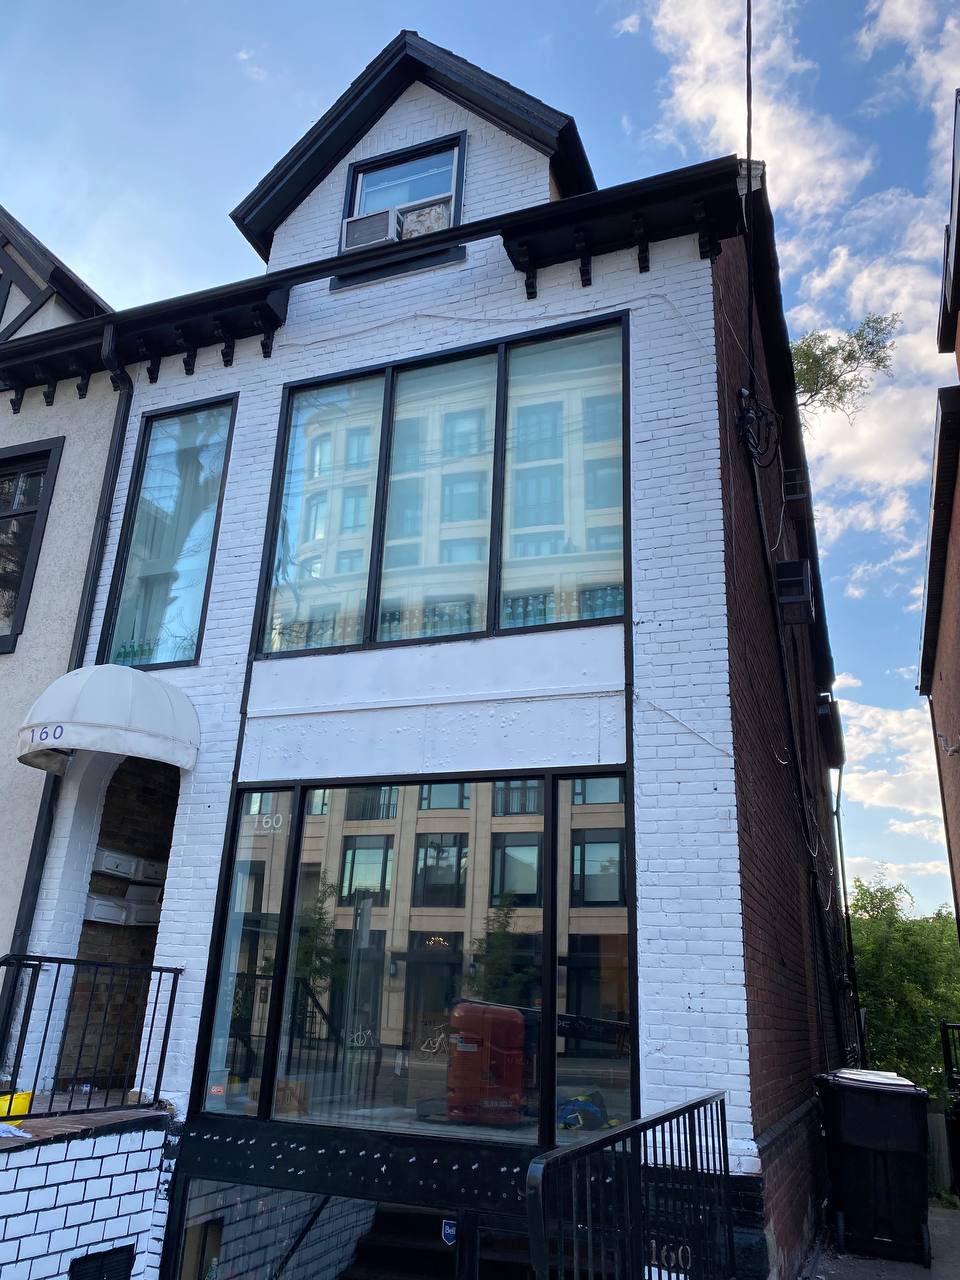 Commercial Renovation Contractors art gallery in Toronto